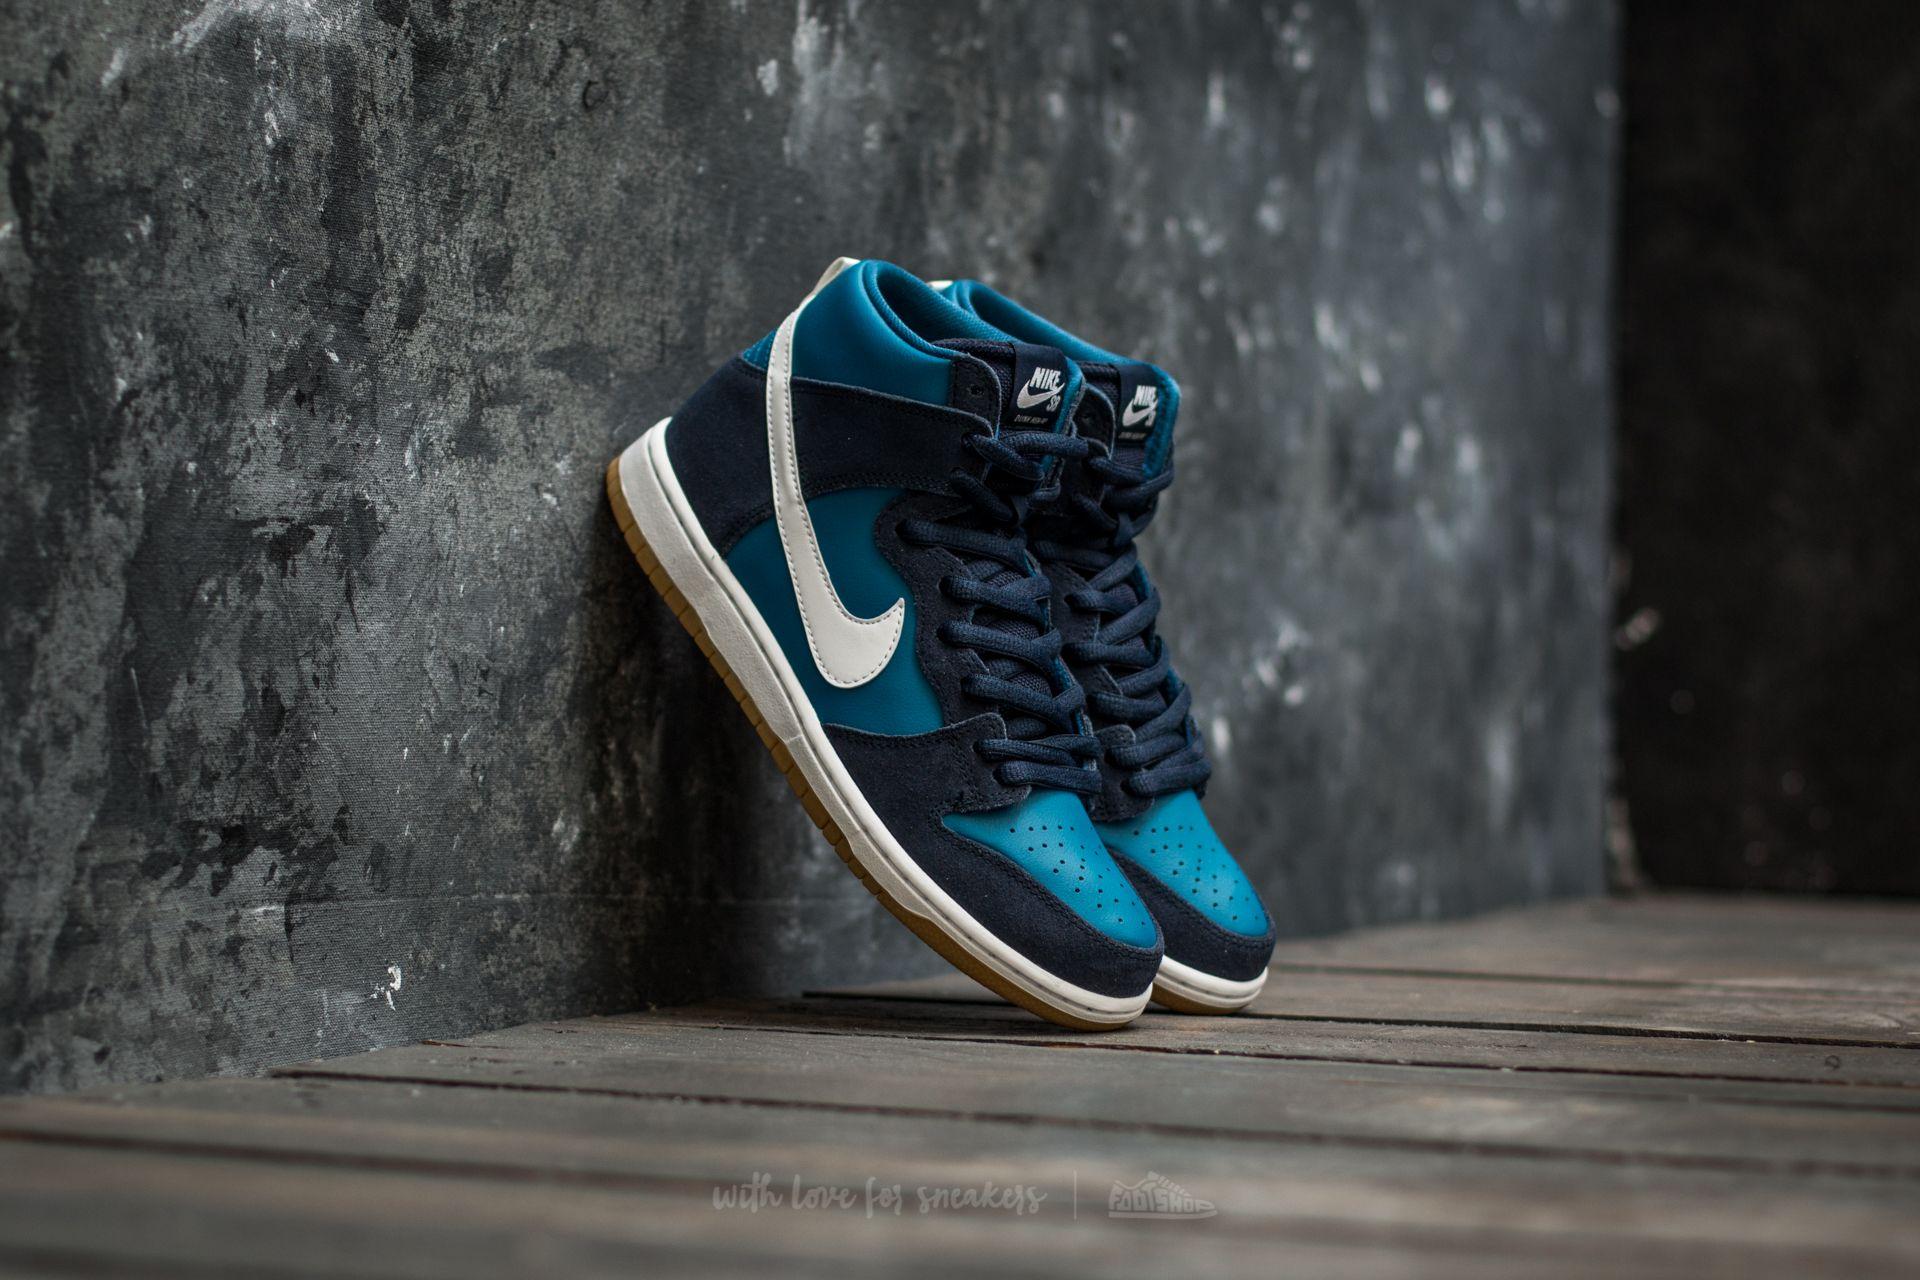 nowy wygląd bliżej na nowe promocje Nike SB Zoom Dunk High Pro Obsidian/ White-Industrial Blue ...